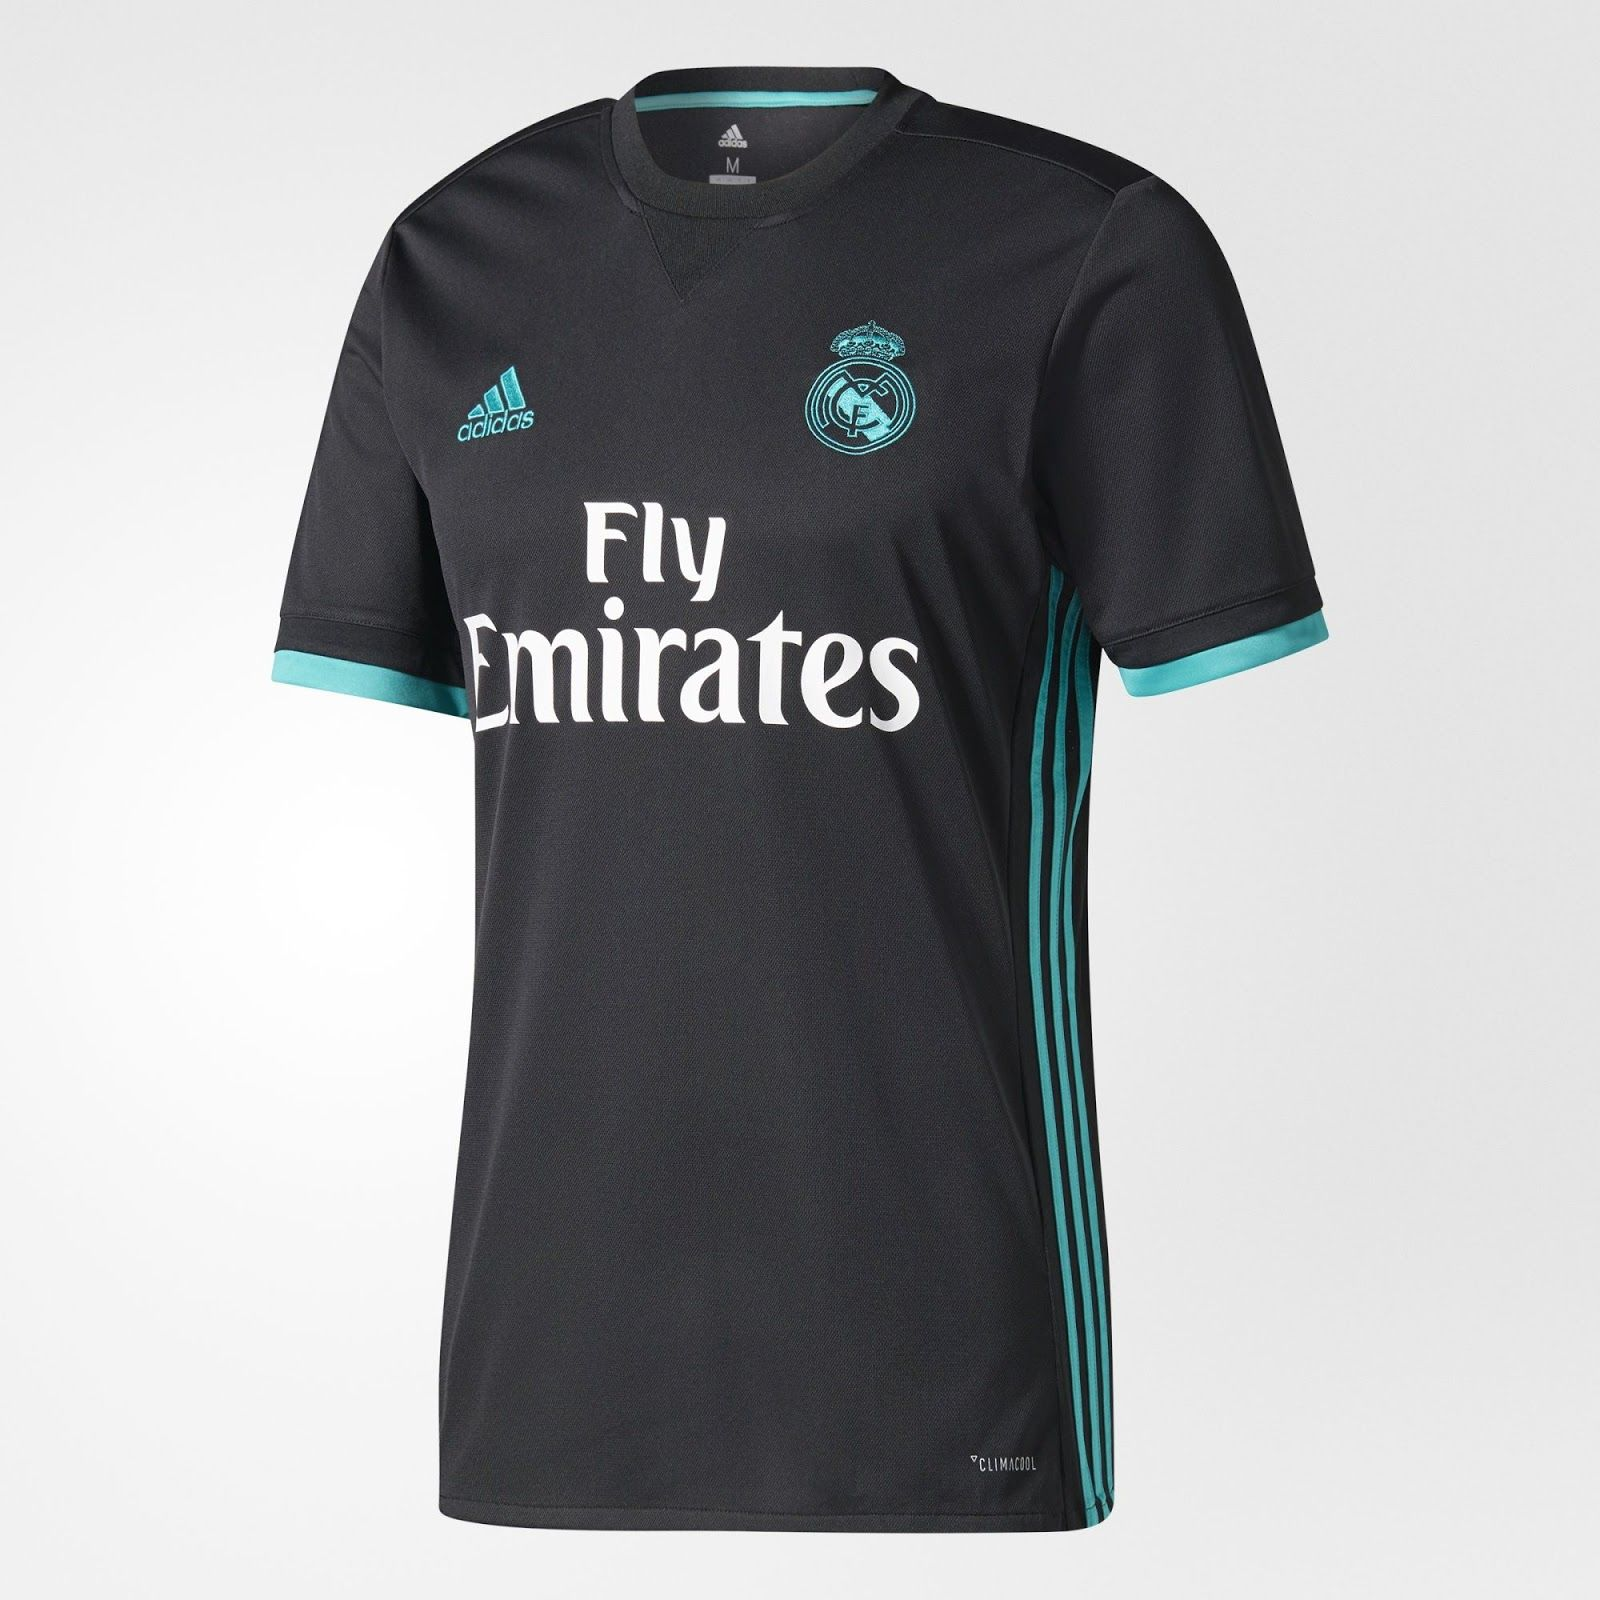 Maillot 2K17- 2K18 Real Madrid Extérieur #RM #Adidas #9ine @Adidas Shirts